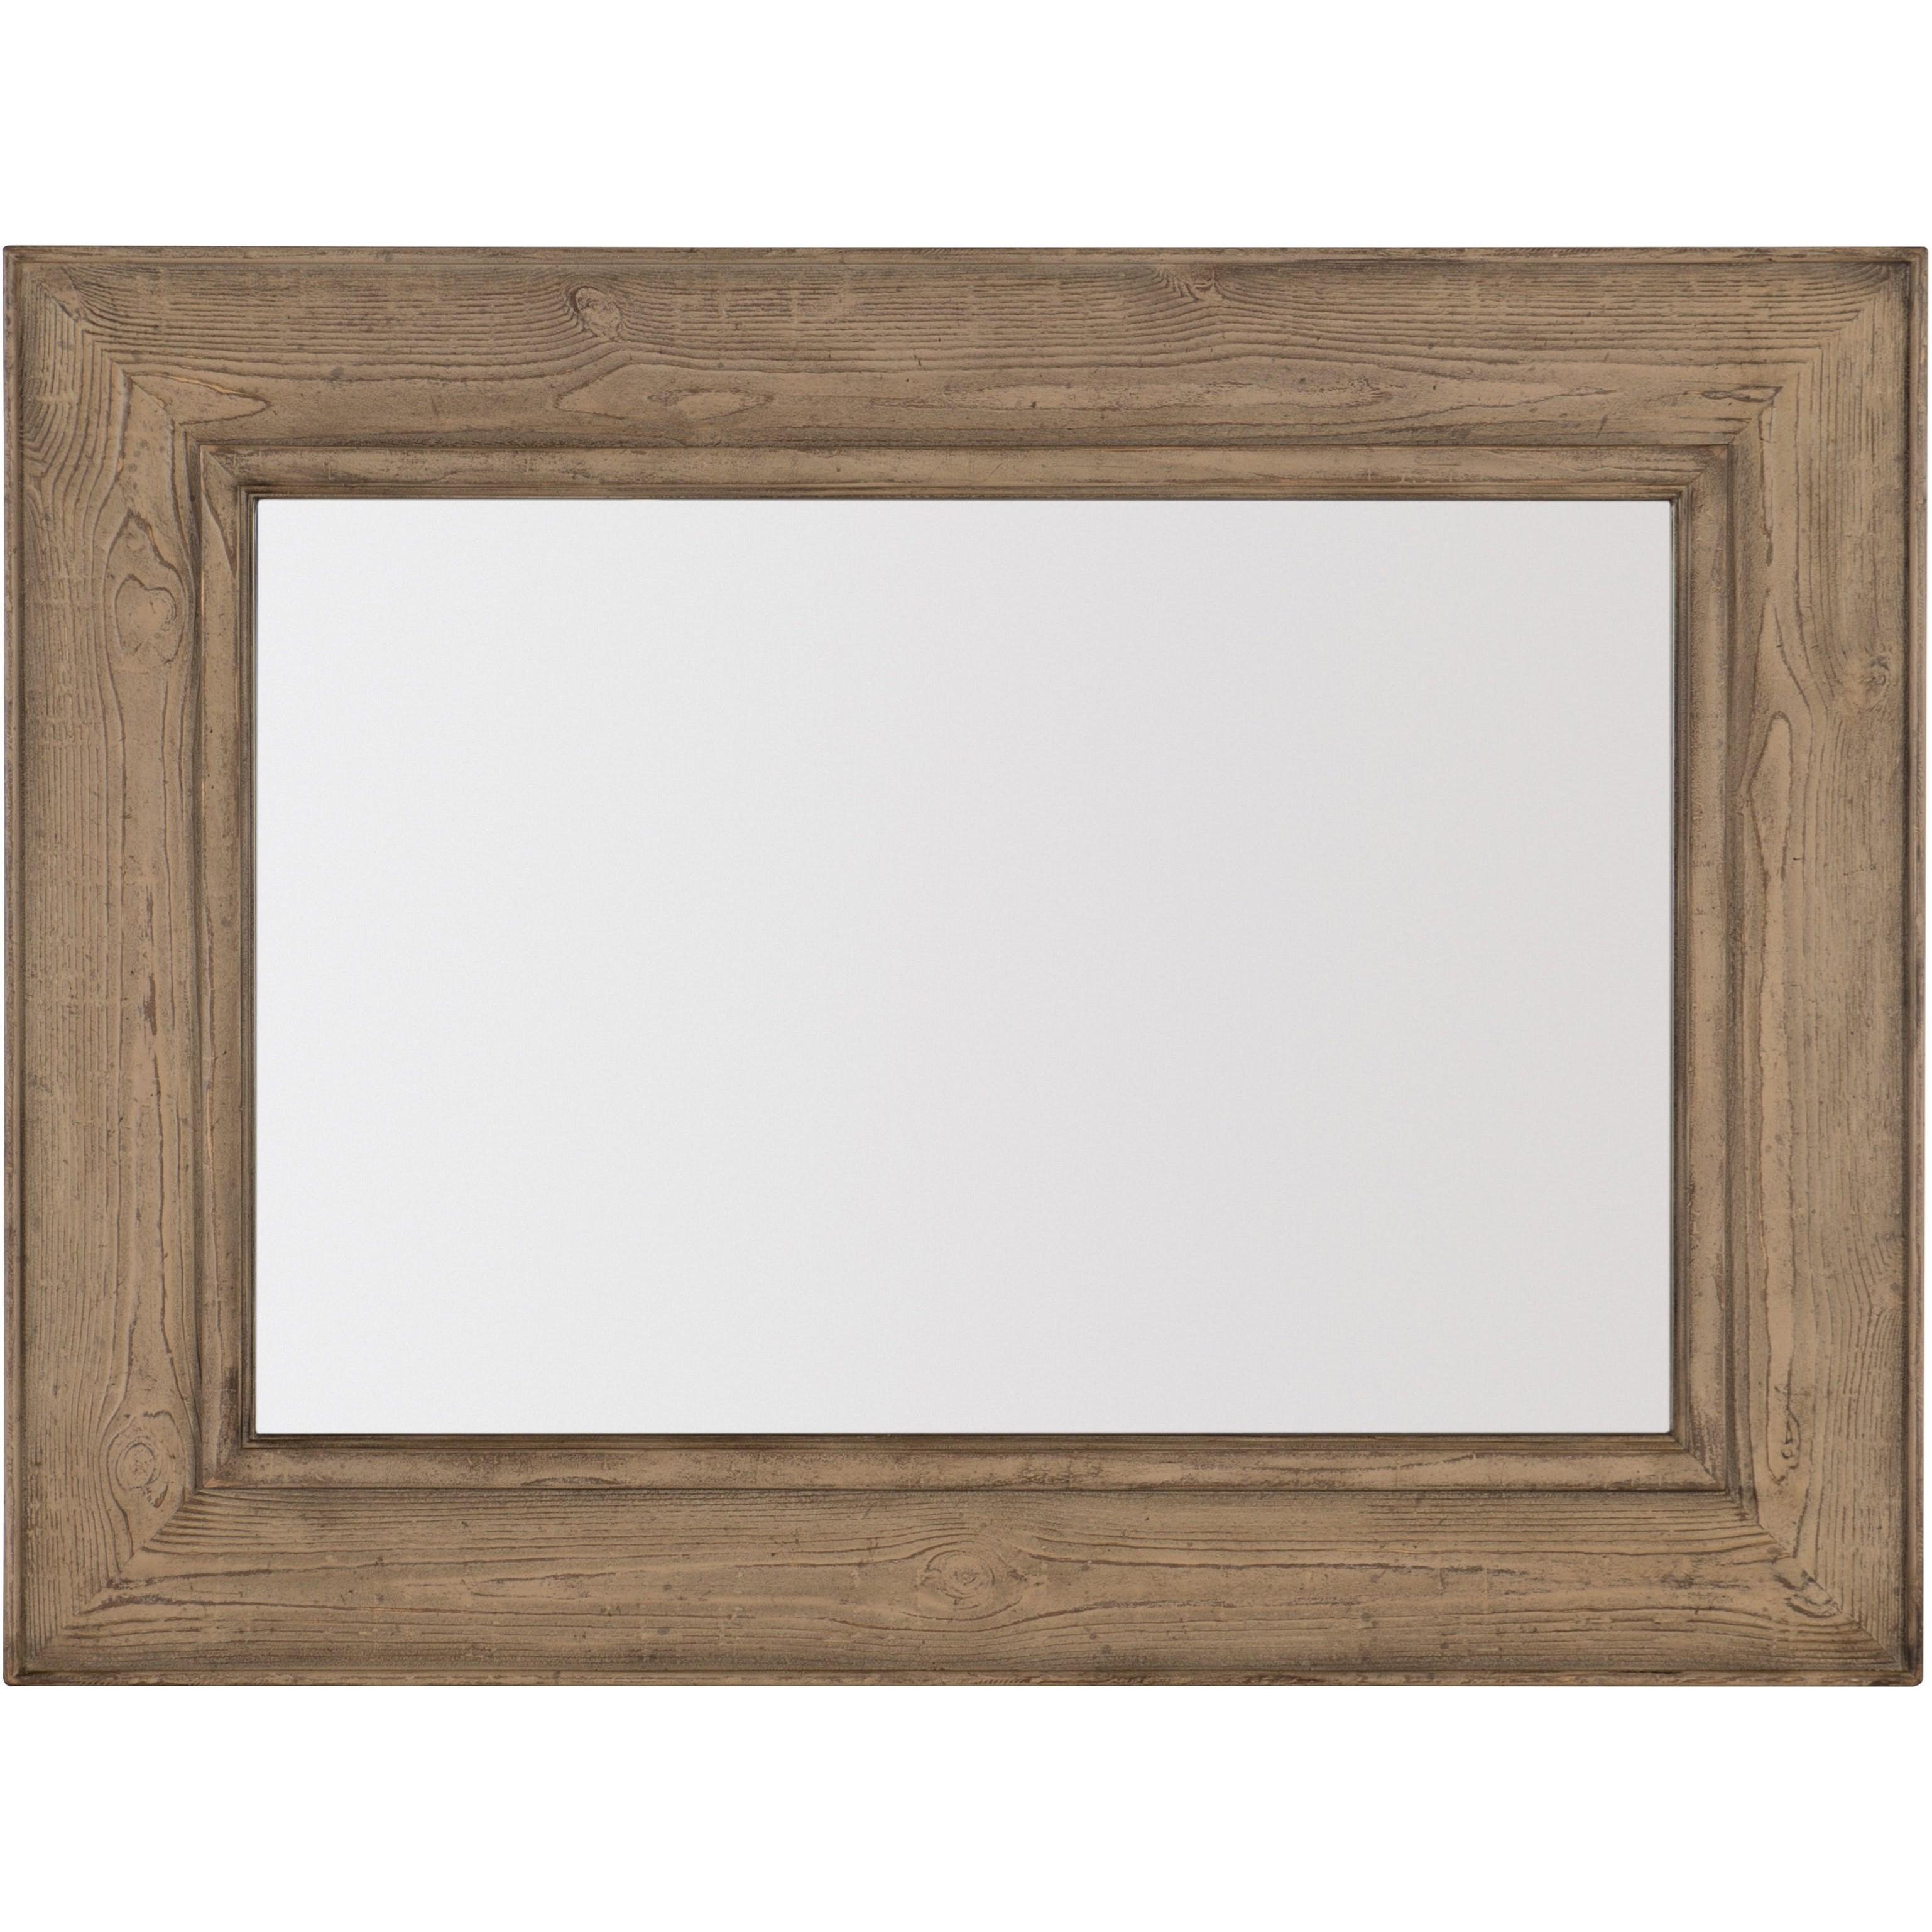 Ciao Bella Landscape Mirror by Hooker Furniture at Baer's Furniture